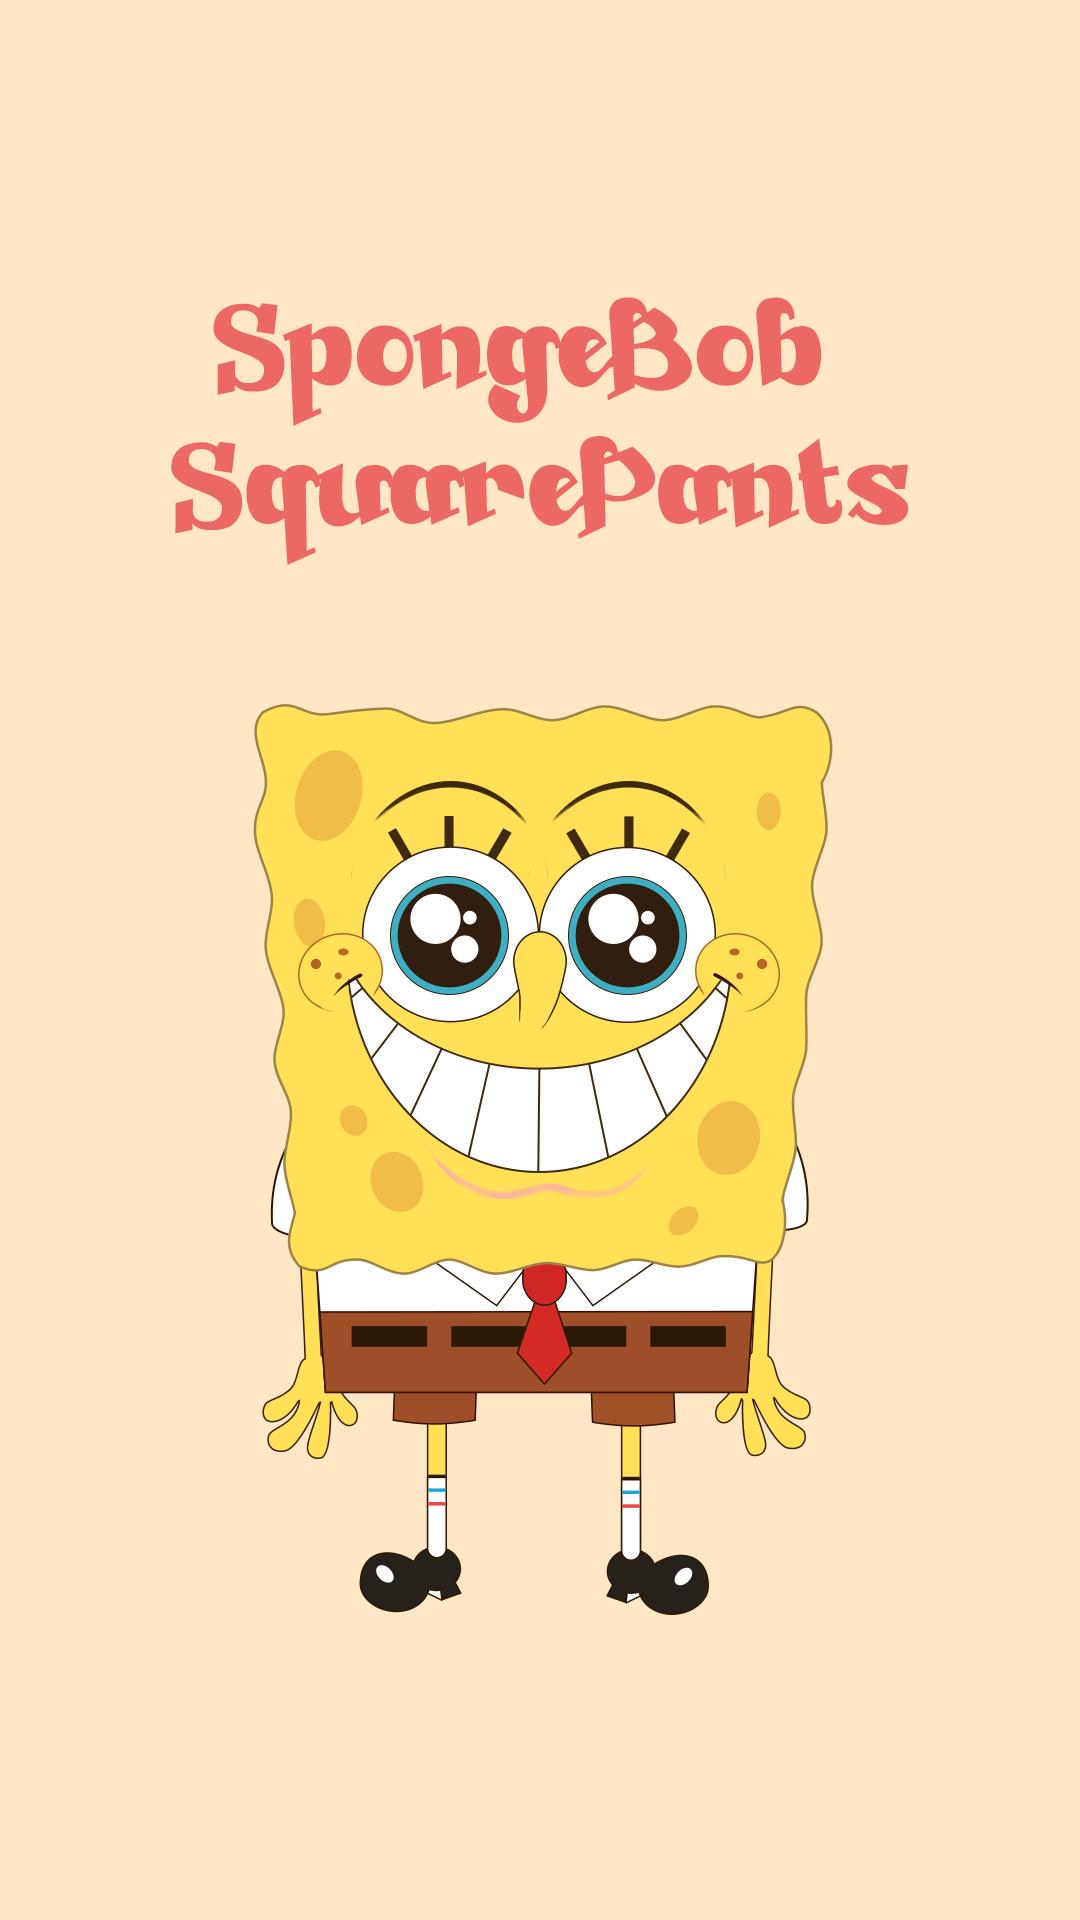 Pin by ZhuLan on SpongeBob SquarePants 海绵宝宝 Phone